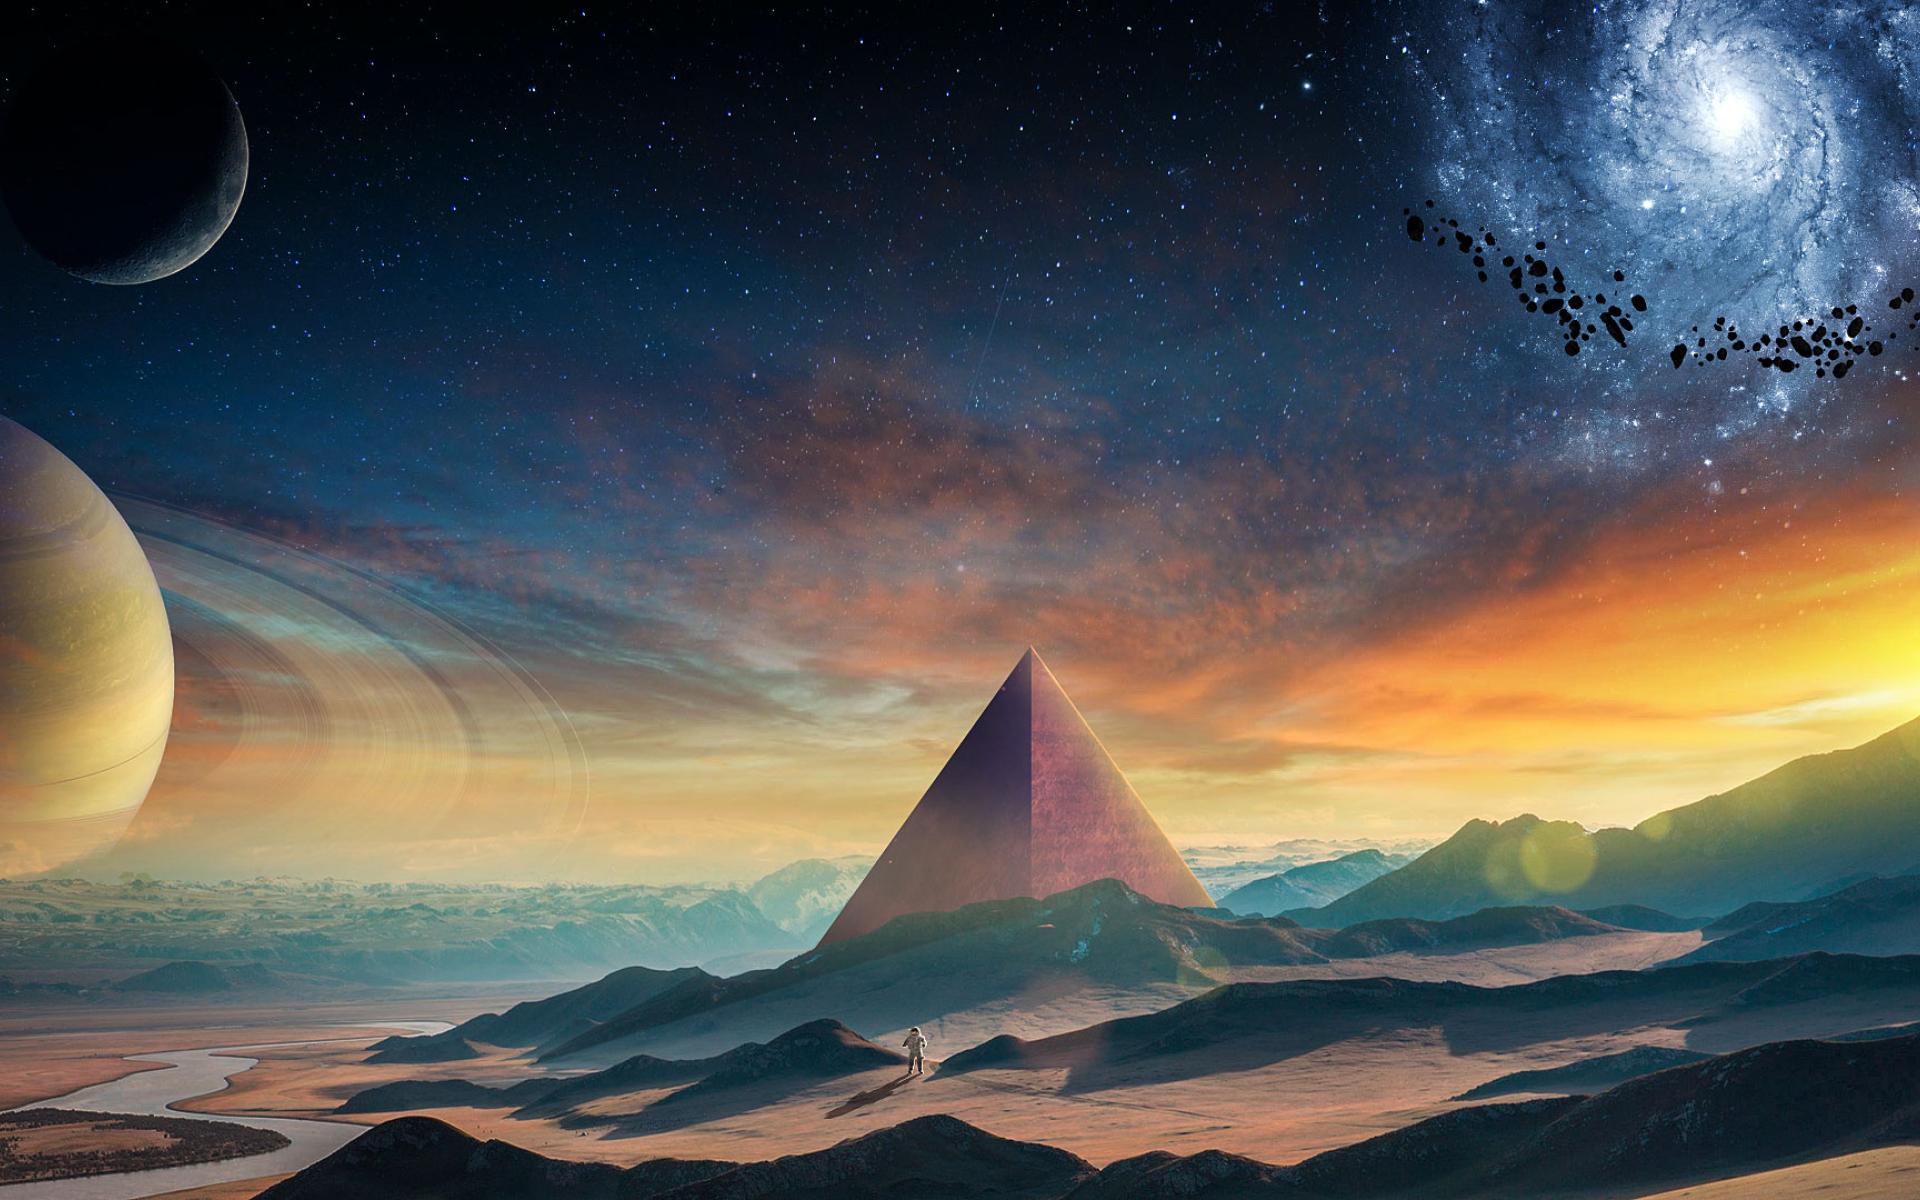 Astronaut Galaxy Pyramid, Full HD Wallpaper